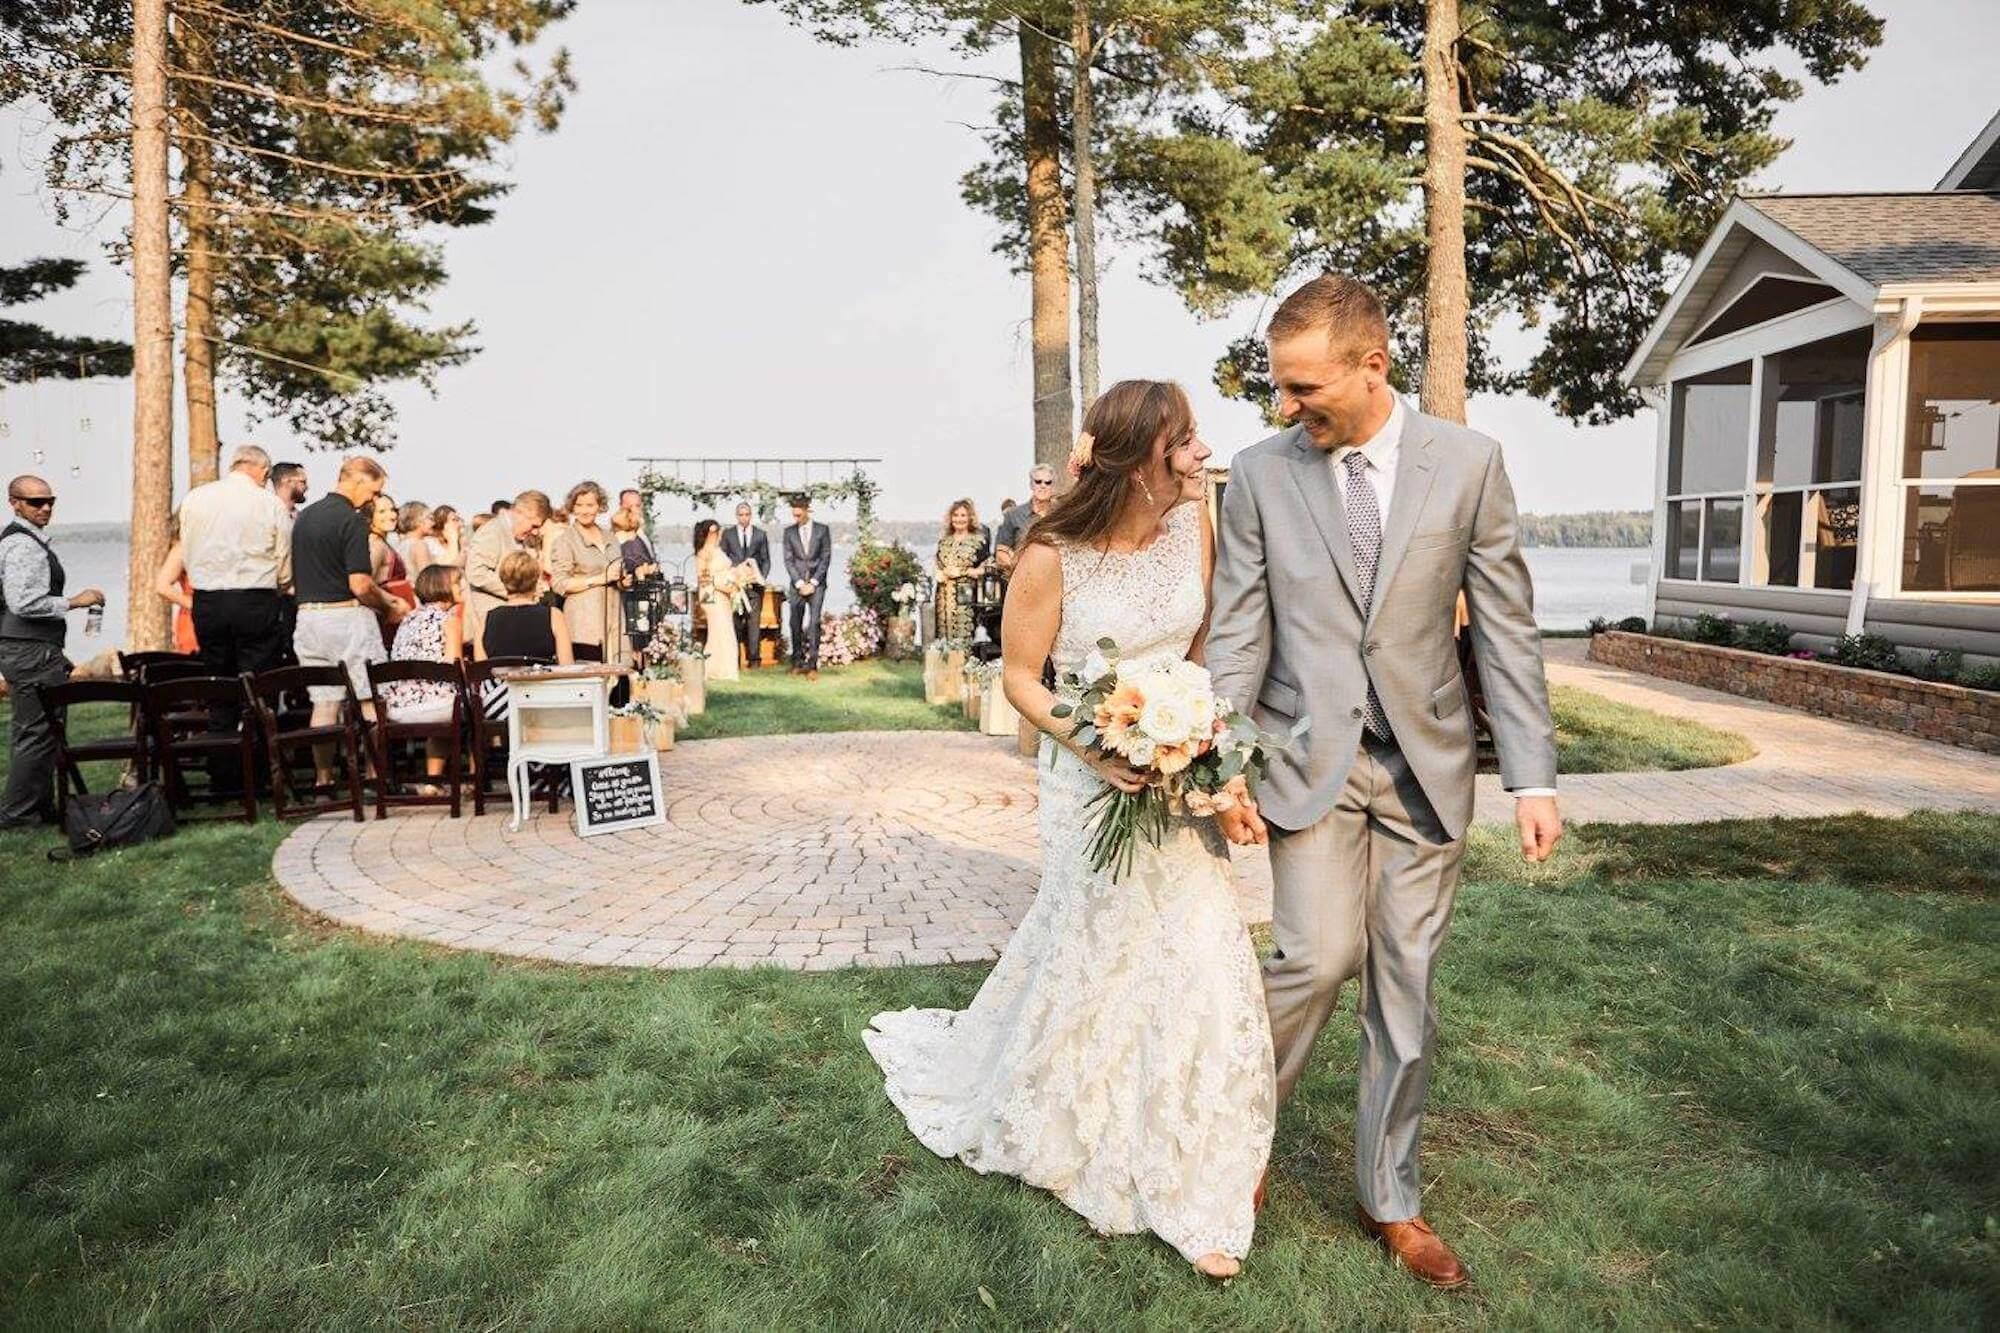 engle-olson-wedding-video-perry-james-photography-34.jpg